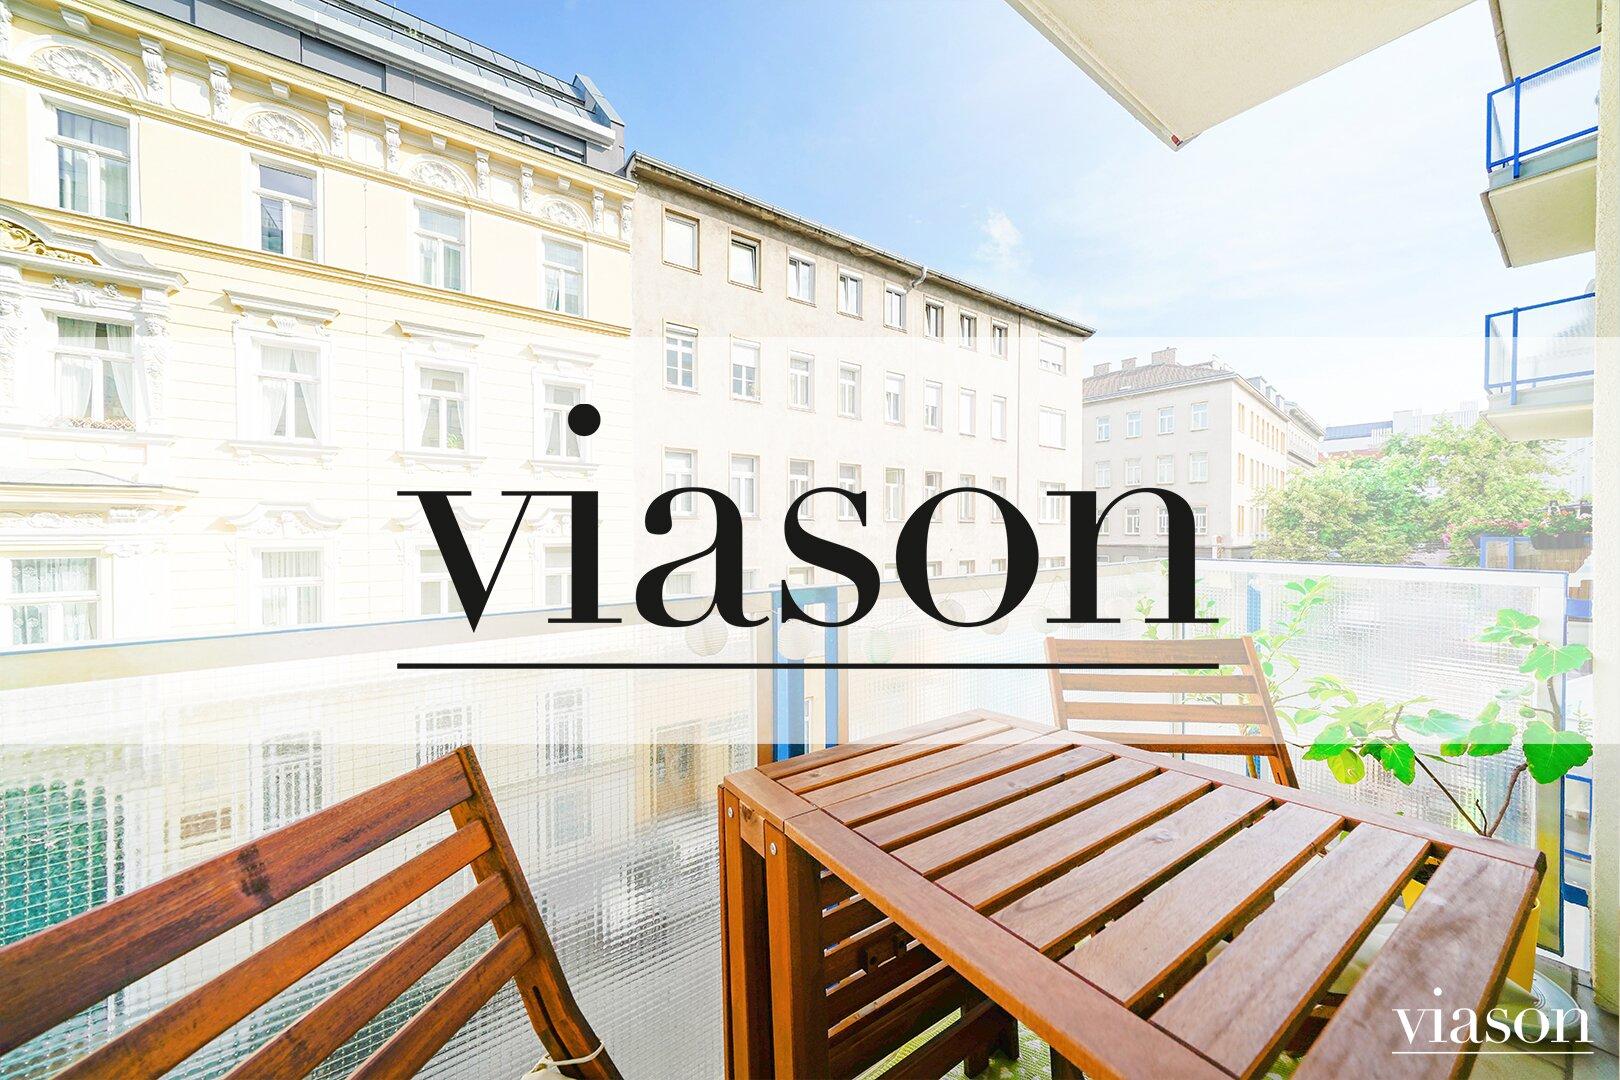 www.viason.at